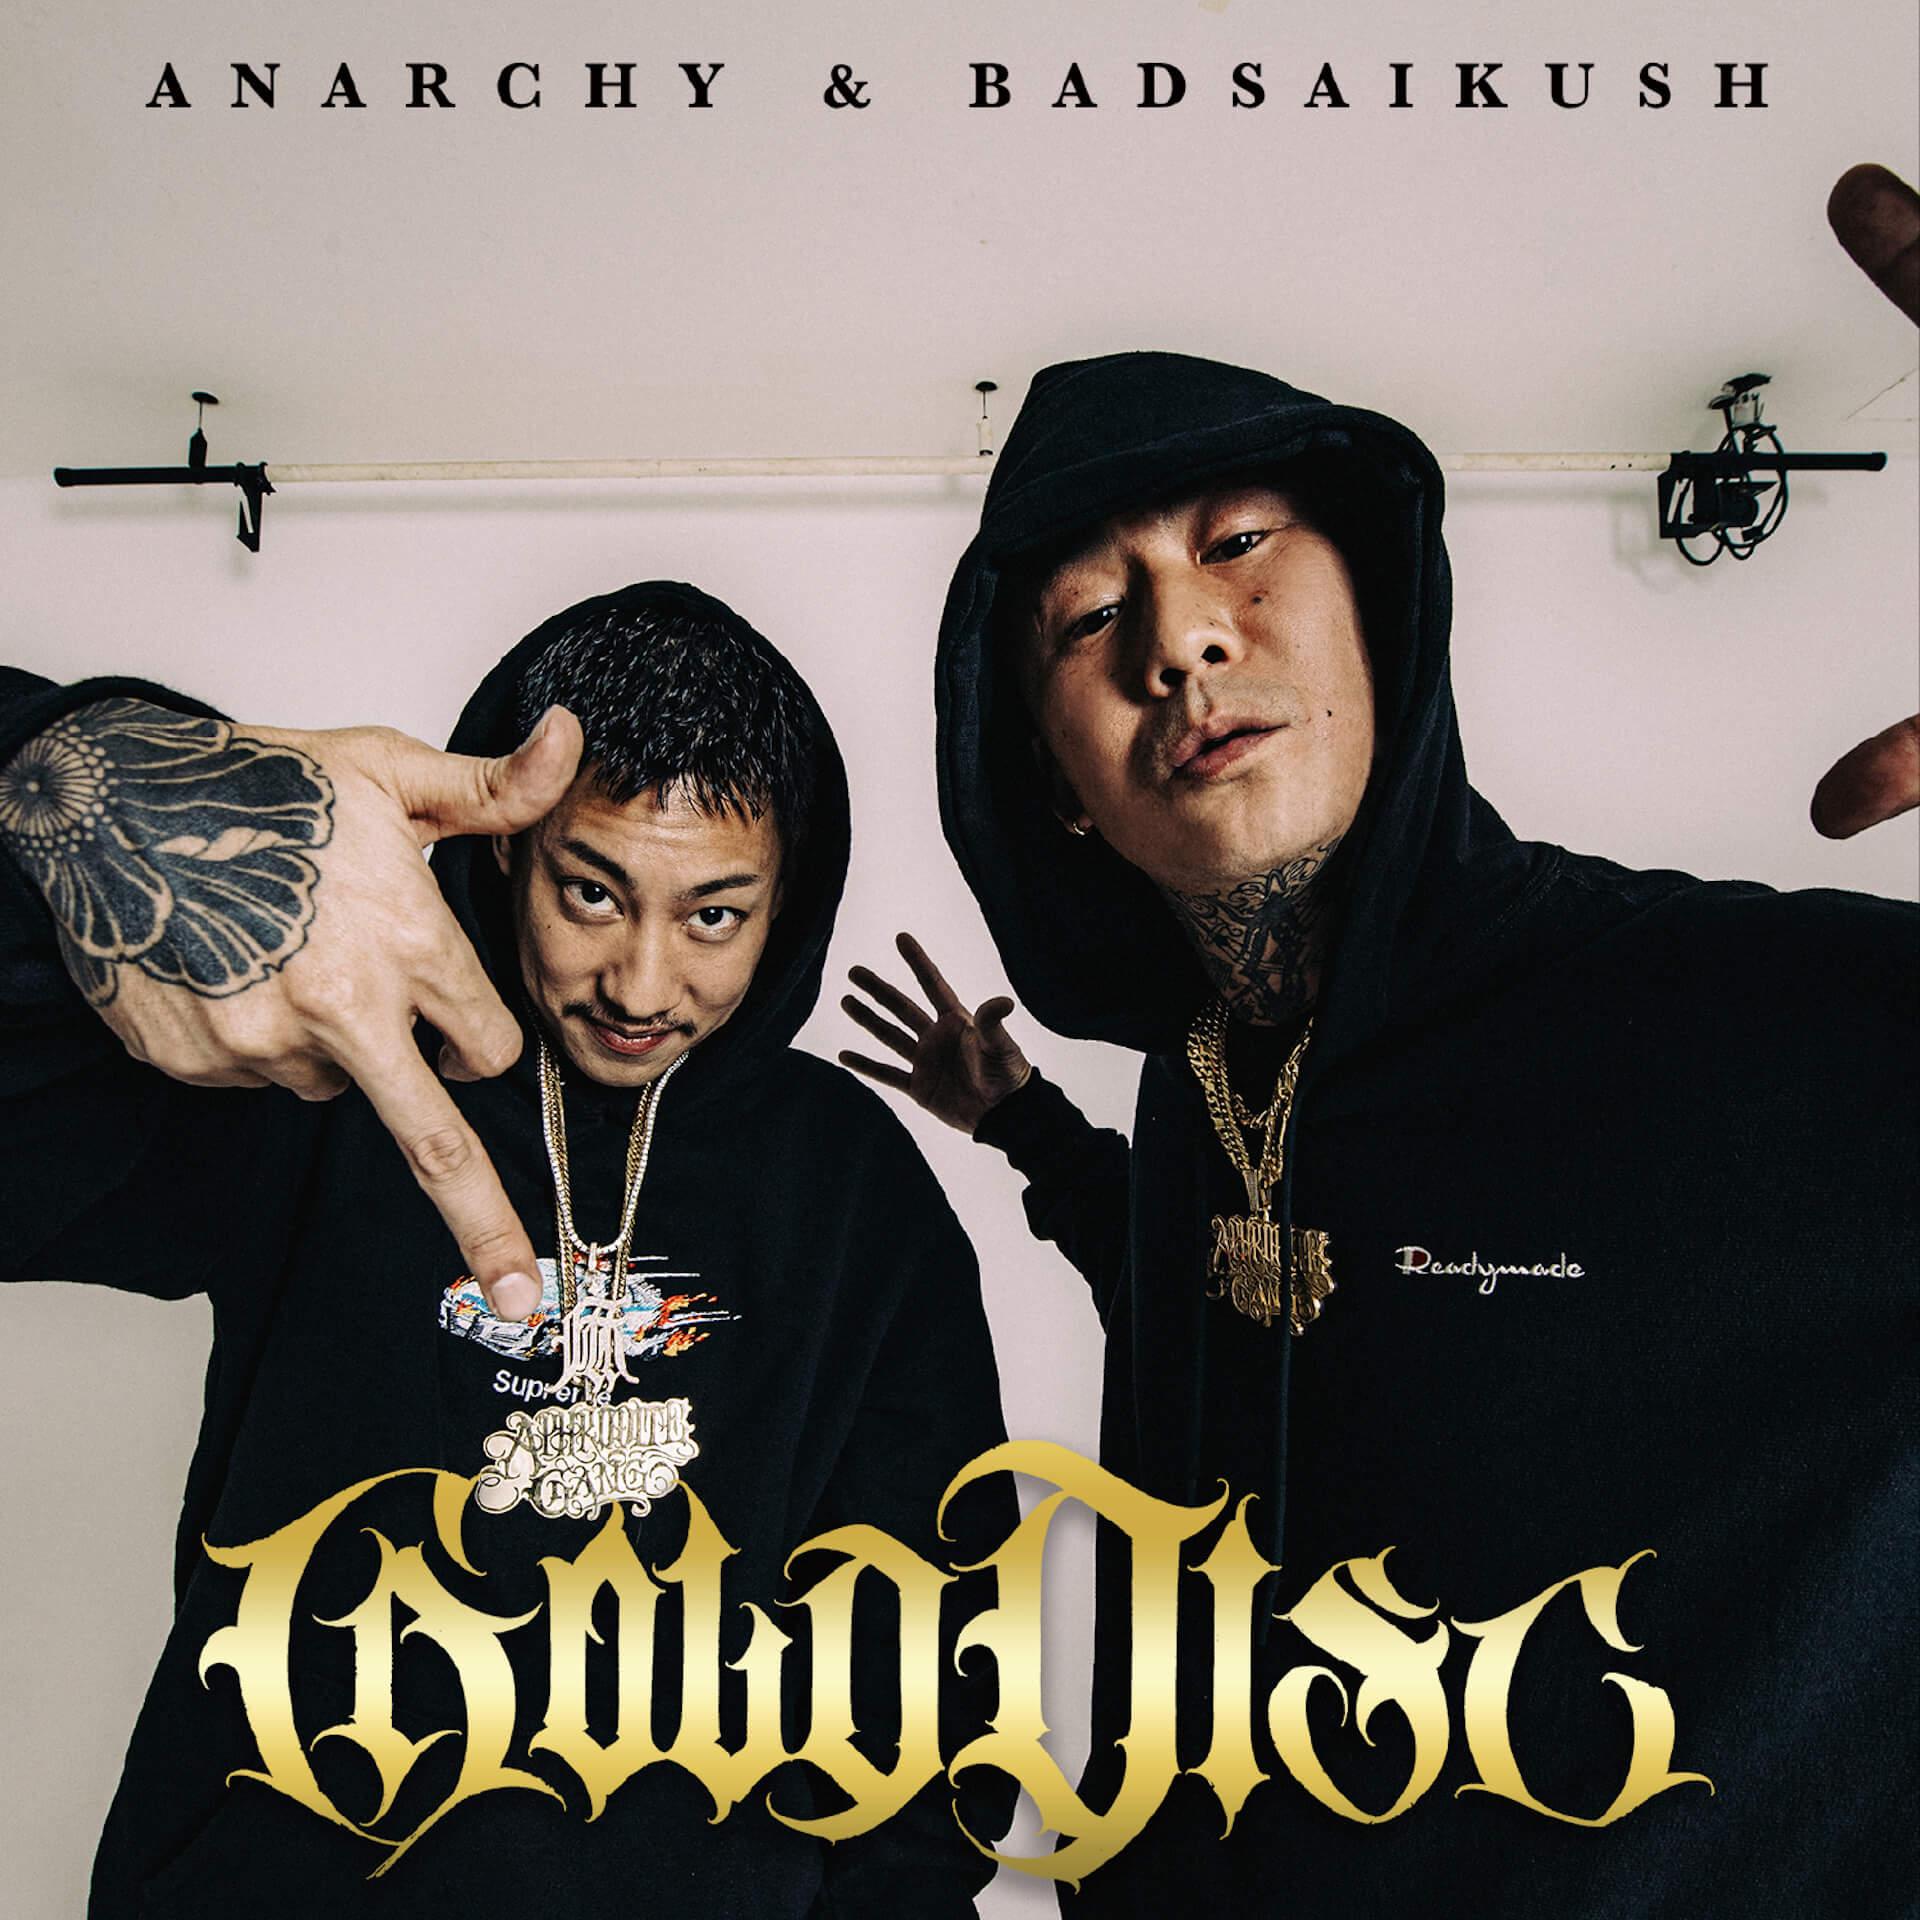 ANARCHYとBADASAIKUSHのコラボEP『GOLD DISC』がアナログ化決定!GREEN ASSASSIN DOLLARが手がけたインストも収録 music210107_anarchy_badasaikush_3